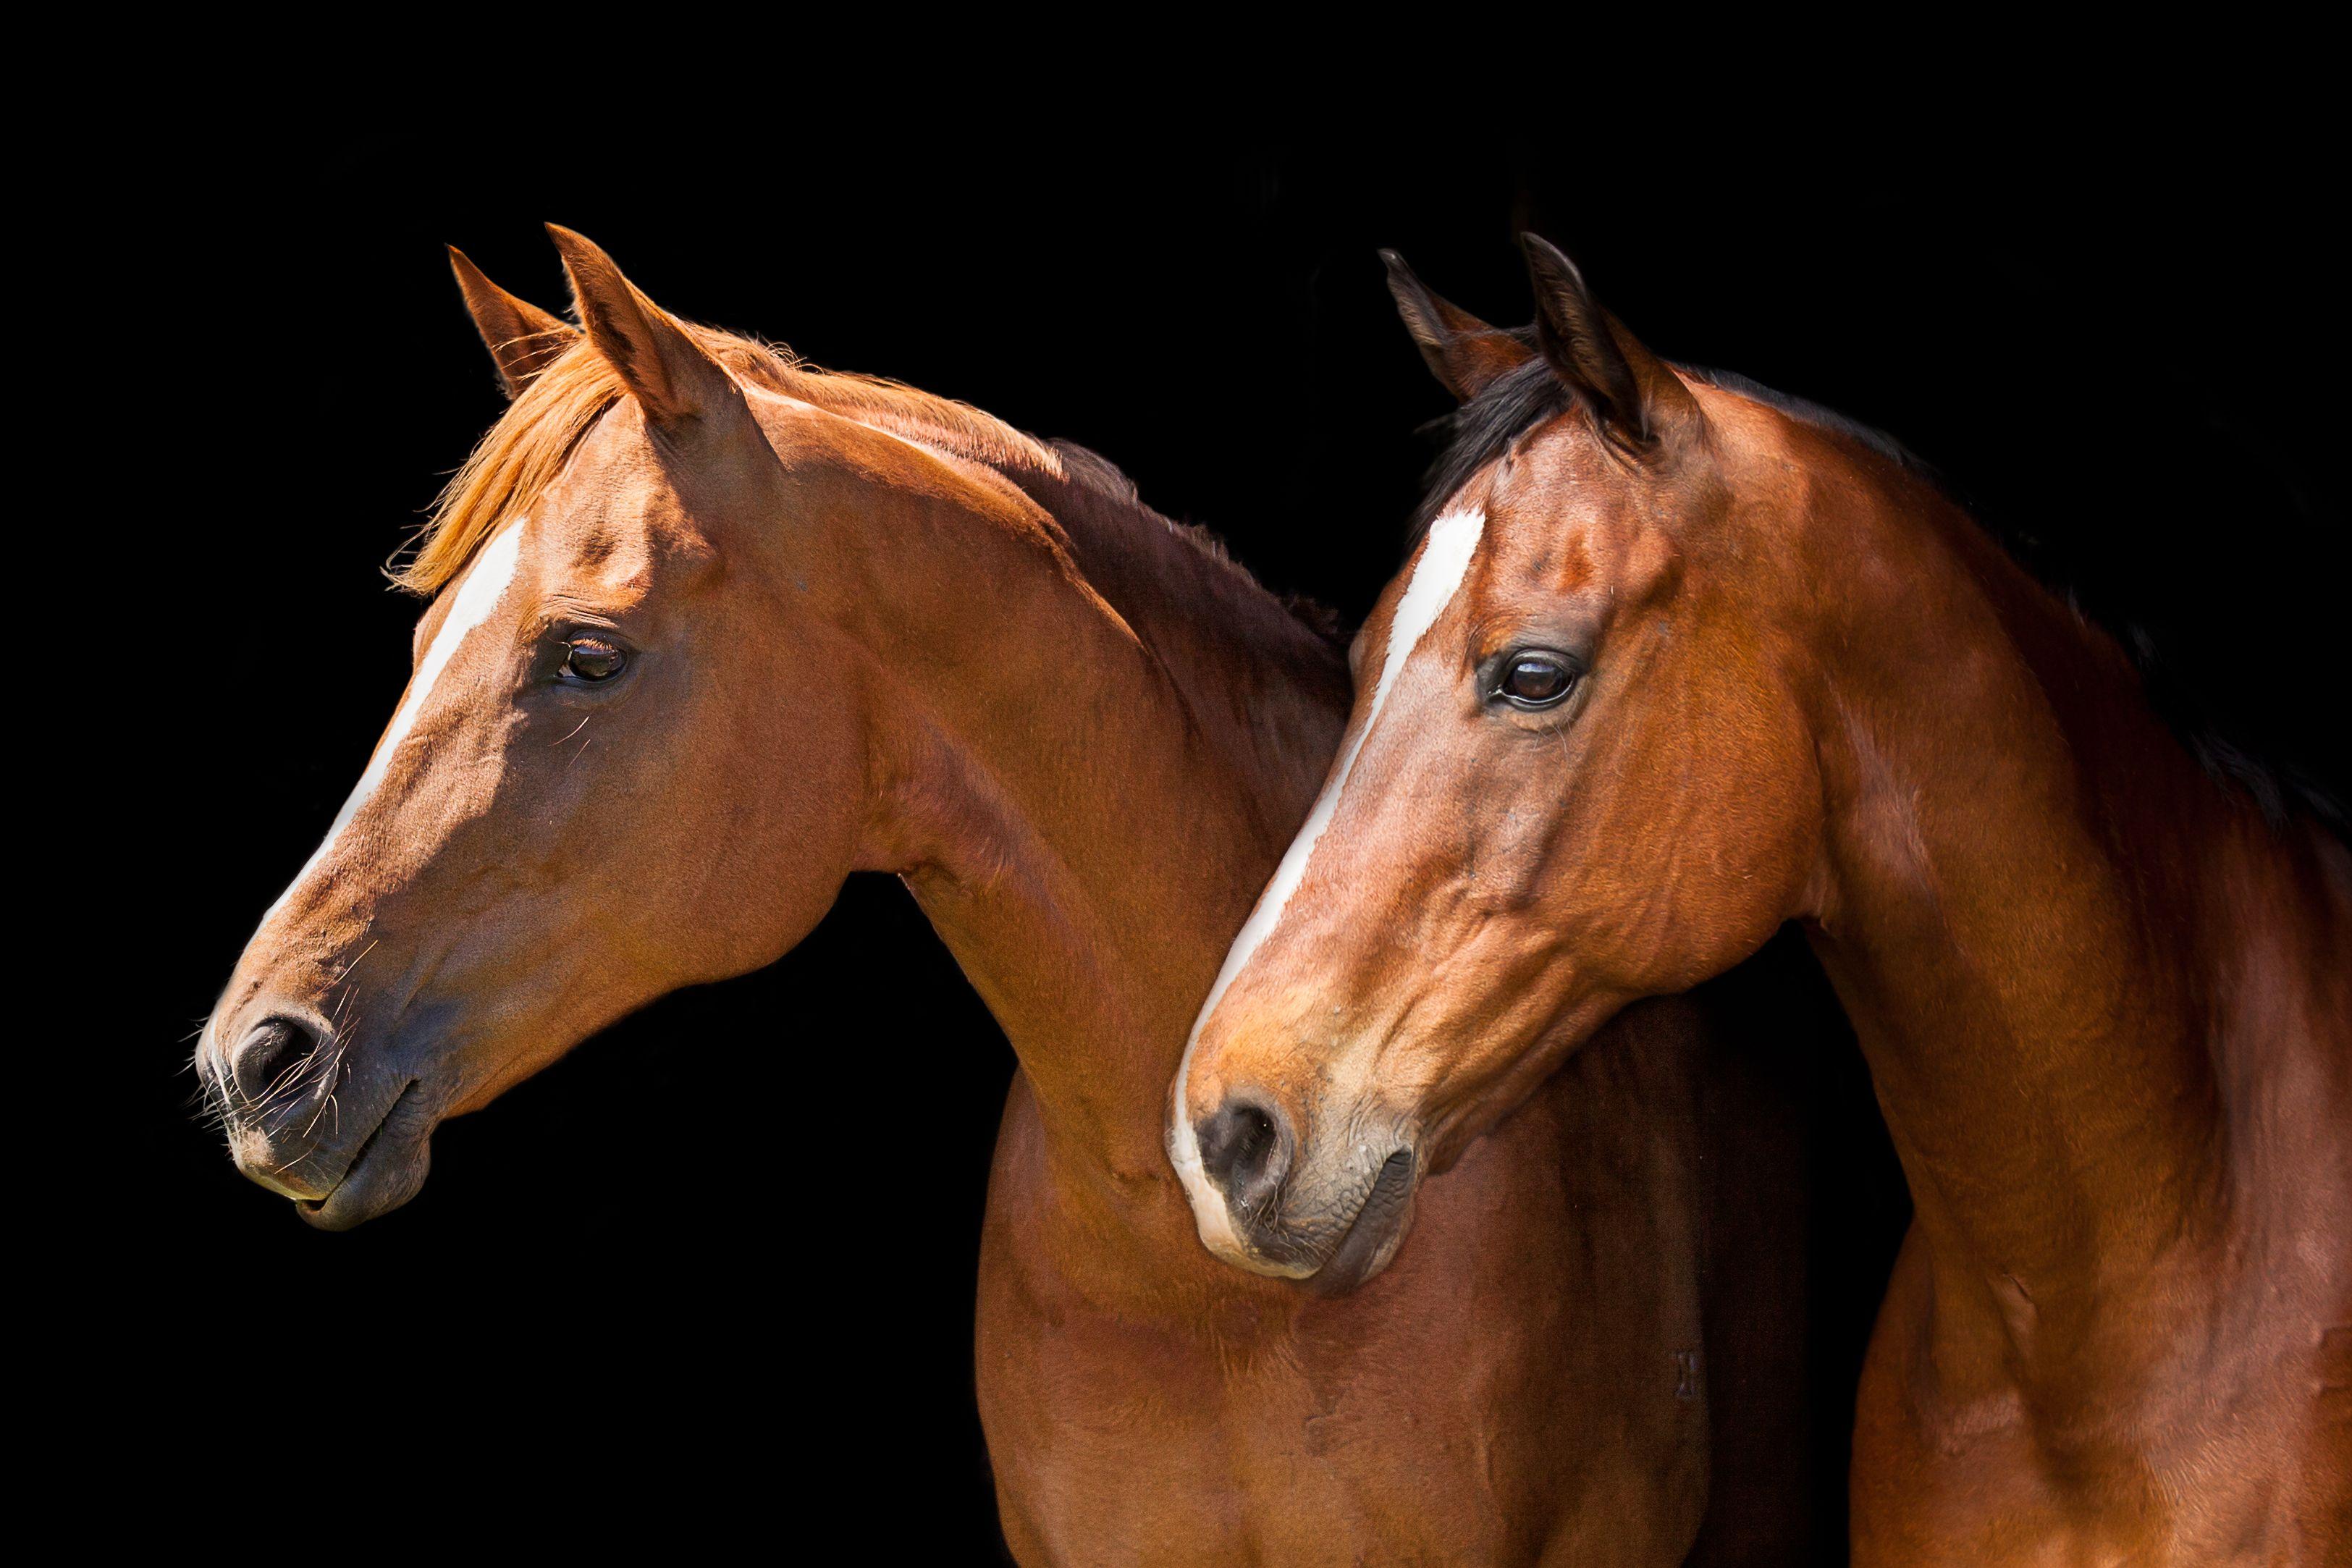 Glass Animals Horses